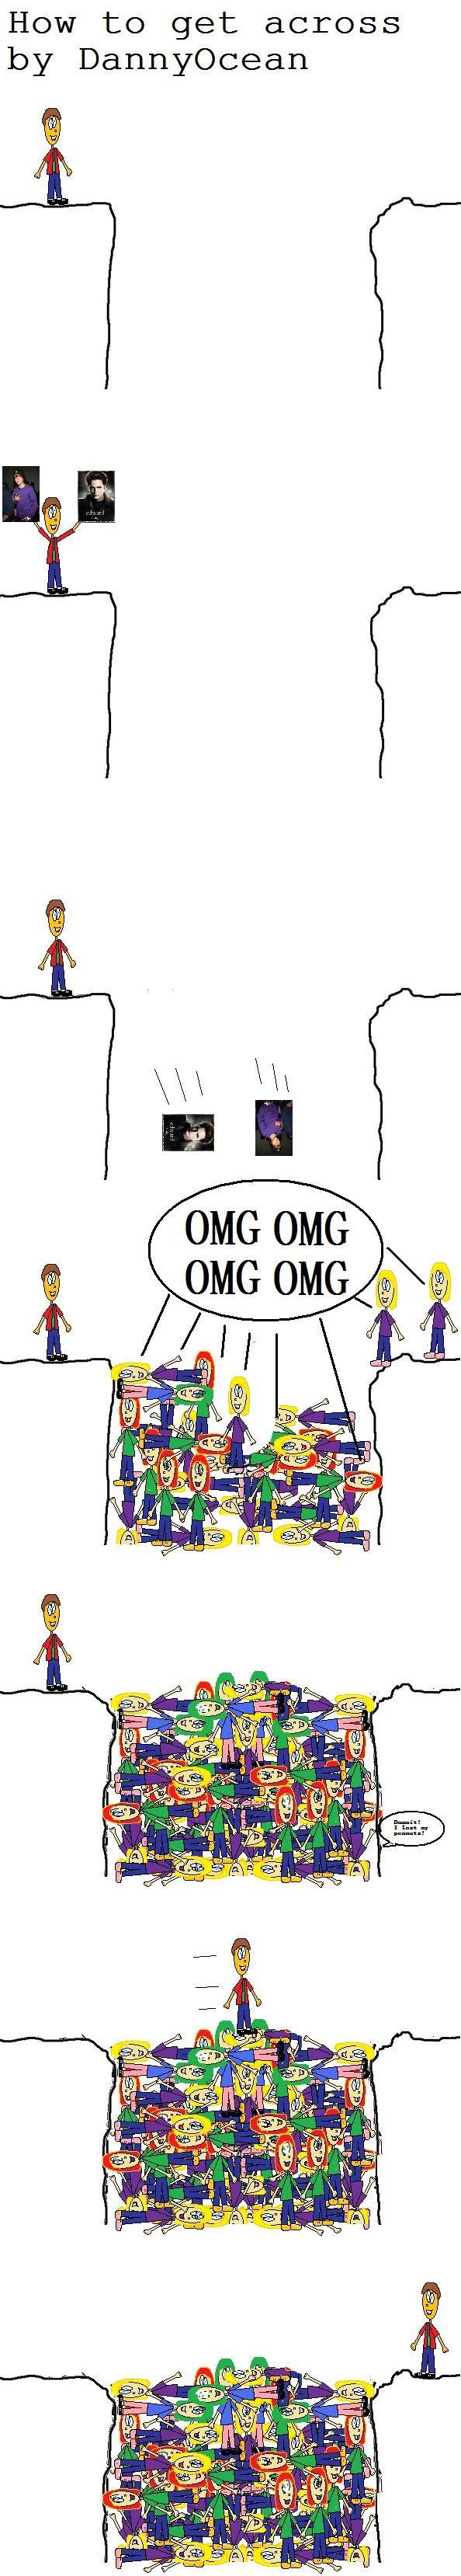 How to get across. I made a sequel!<br /> /funny_pictures/453025/How+to+get+acr.... How to get across toy' Dannyocean. NOOO MA PEANUT!!! comic fun hot to get acros